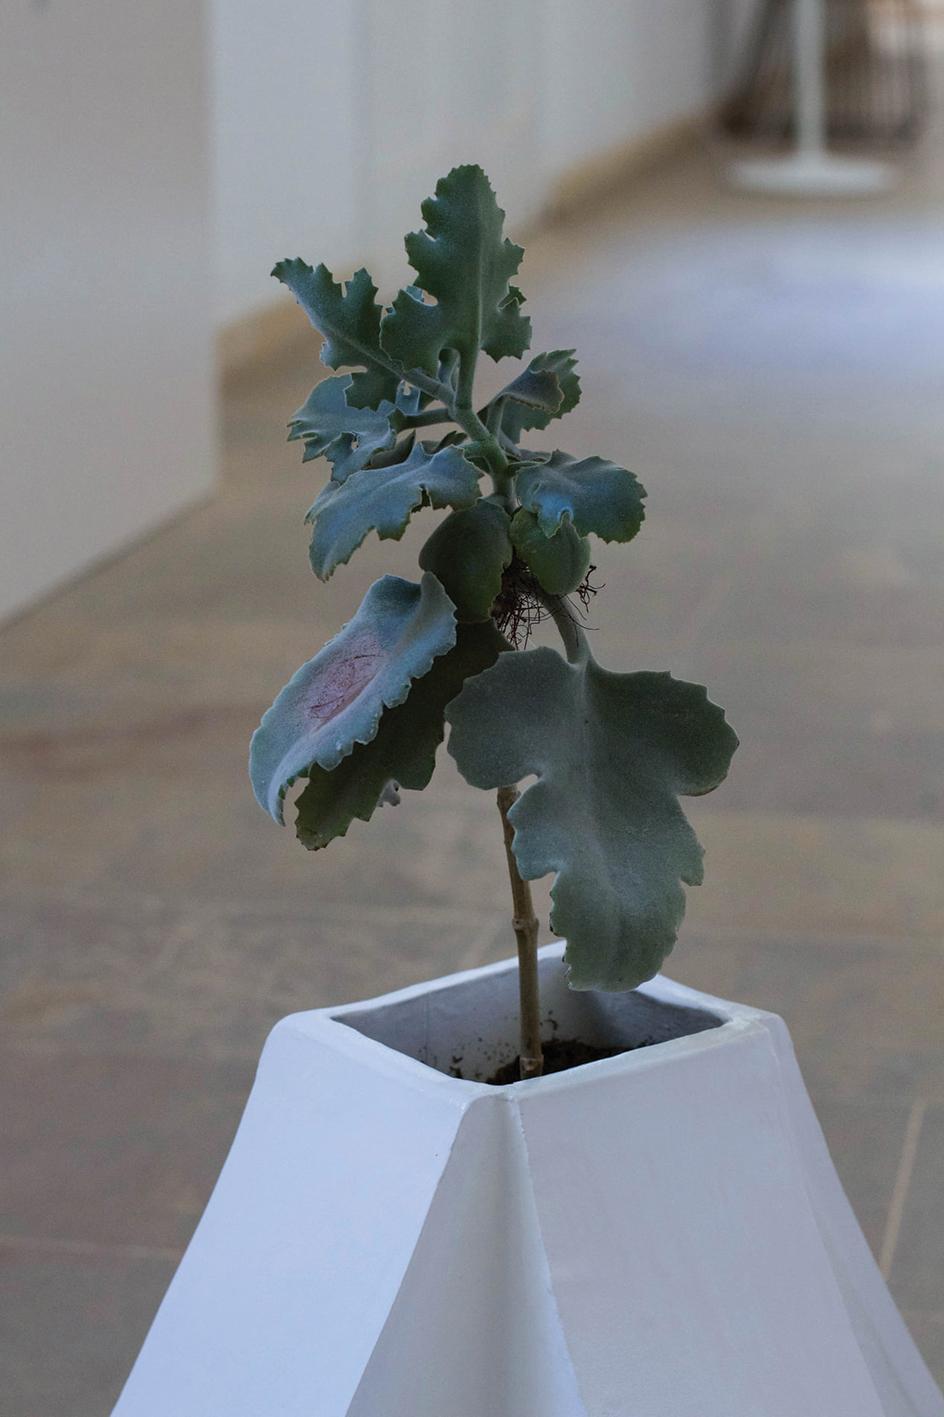 Round Plant Pots Do Not Fit by Keit Bonnici